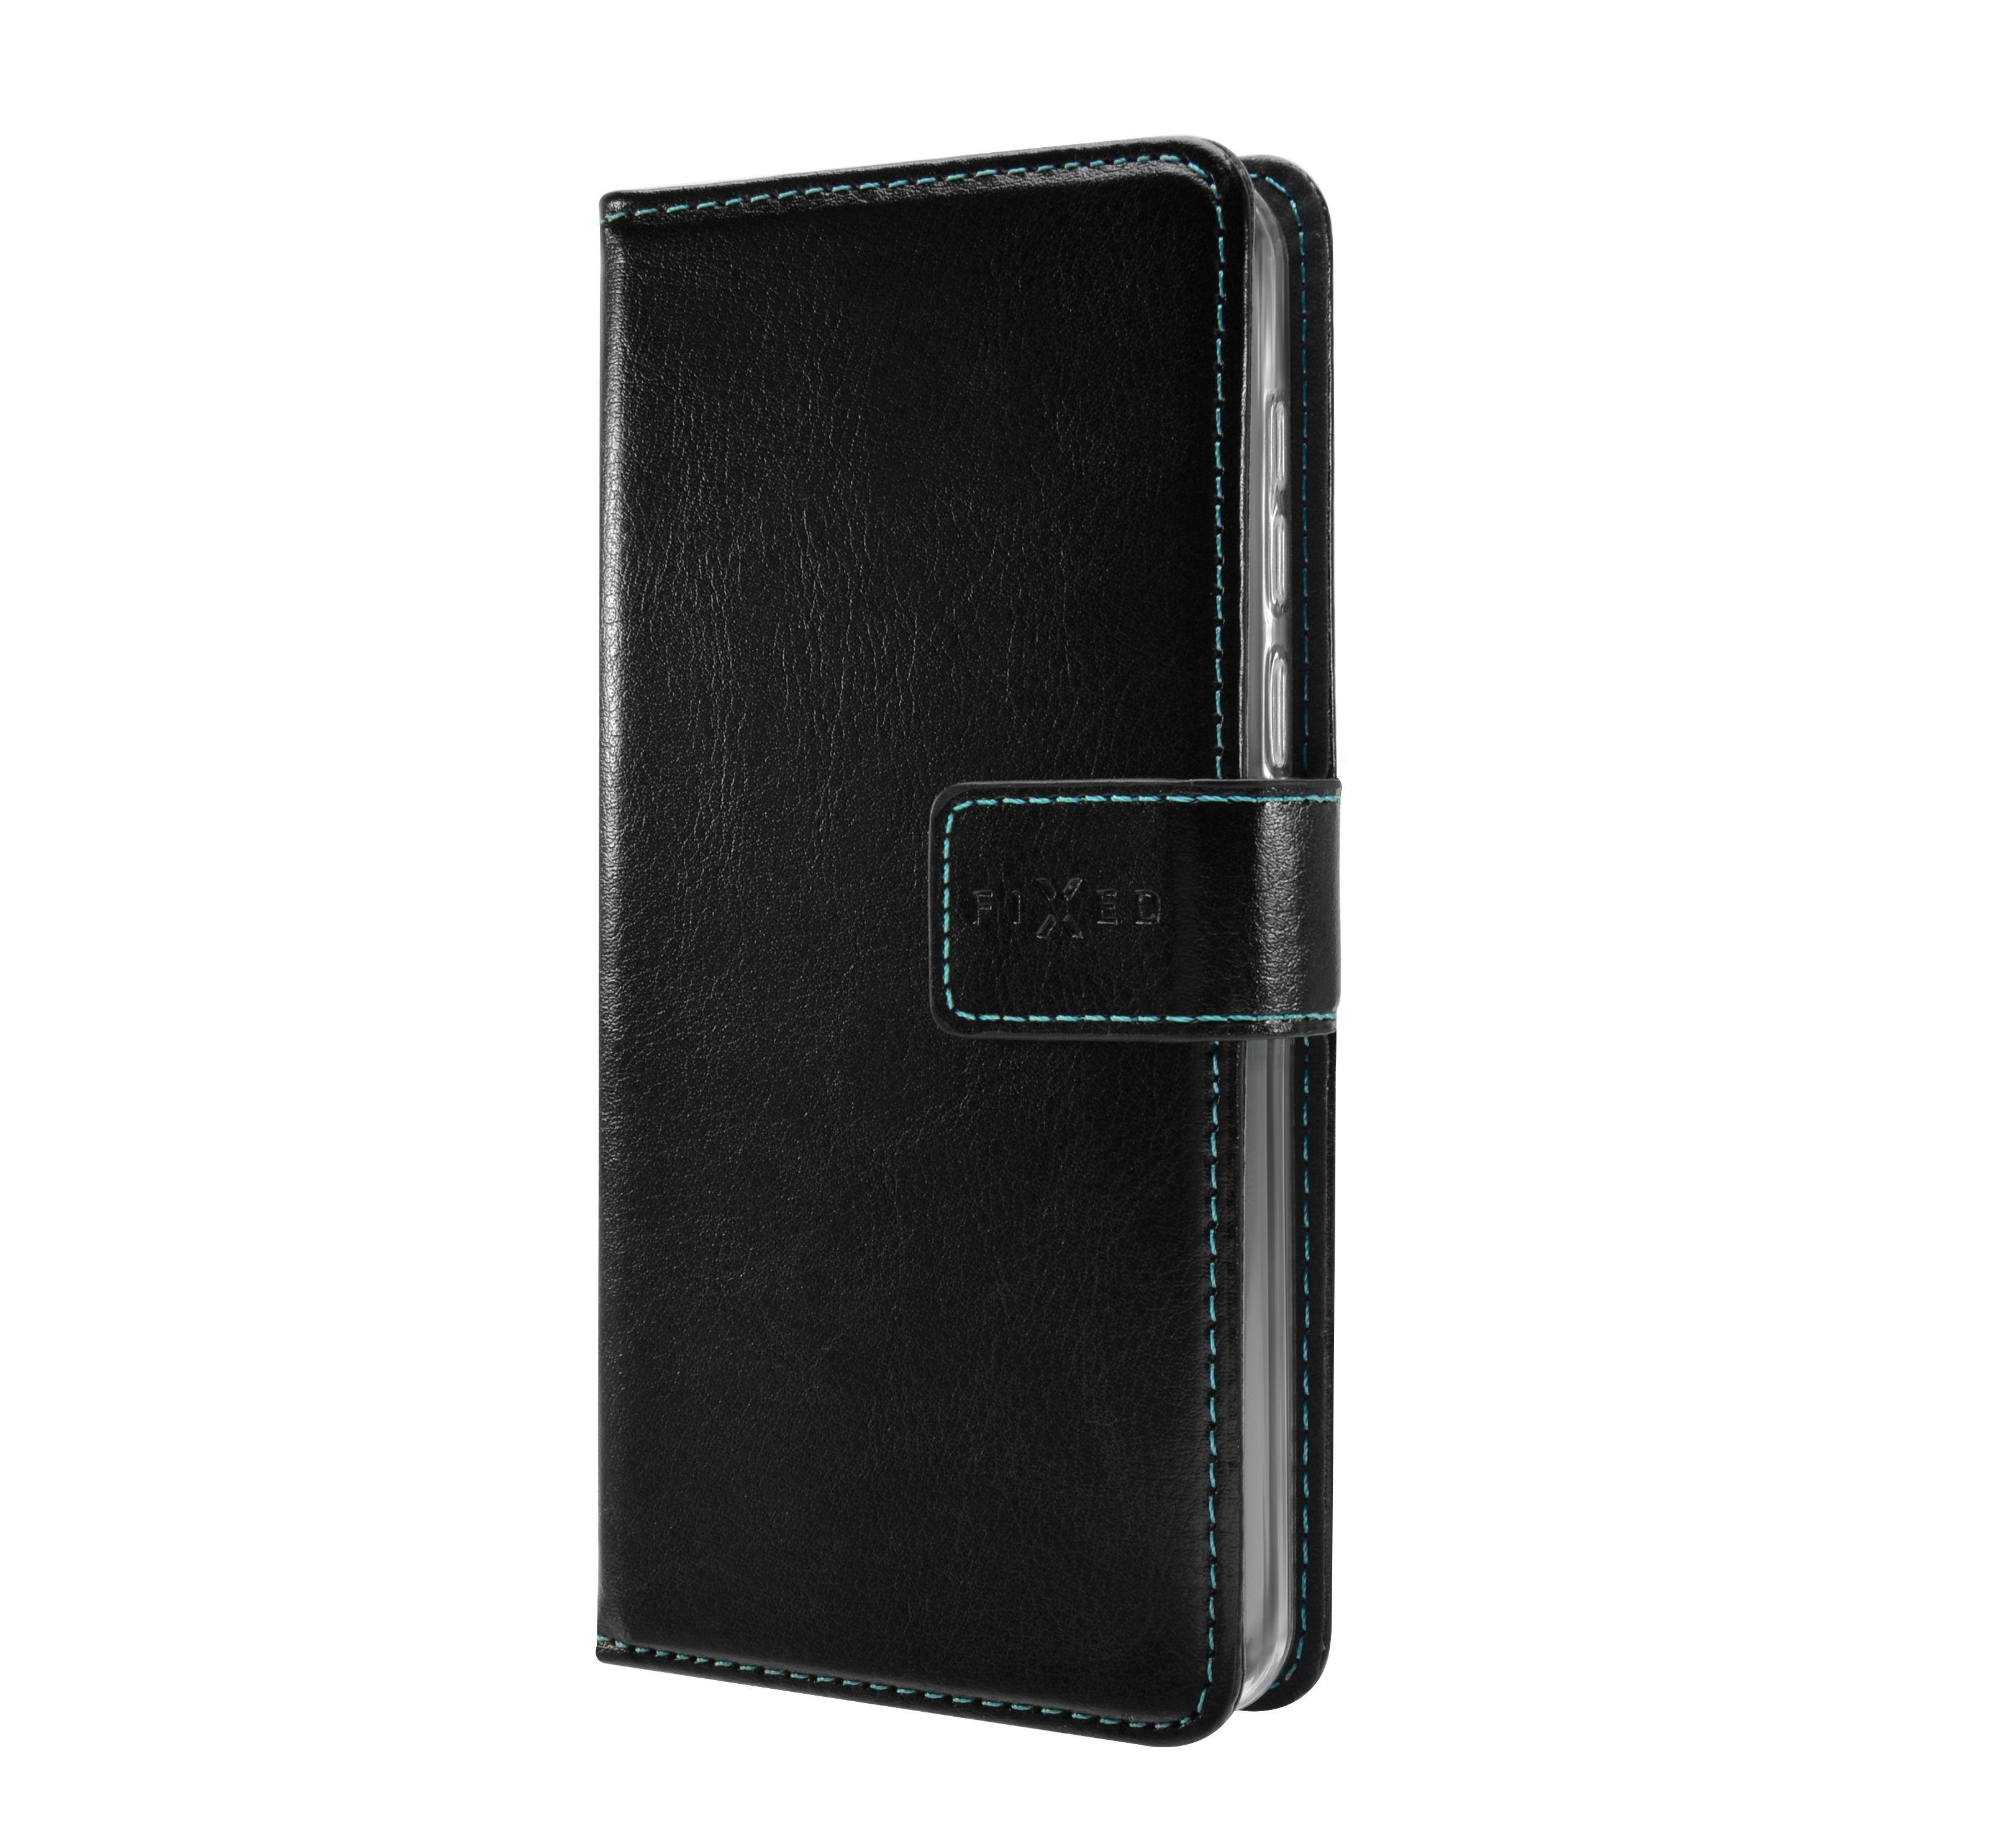 Pouzdro typu kniha FIXED Opus pro Samsung Galaxy A6+ (2018), černé